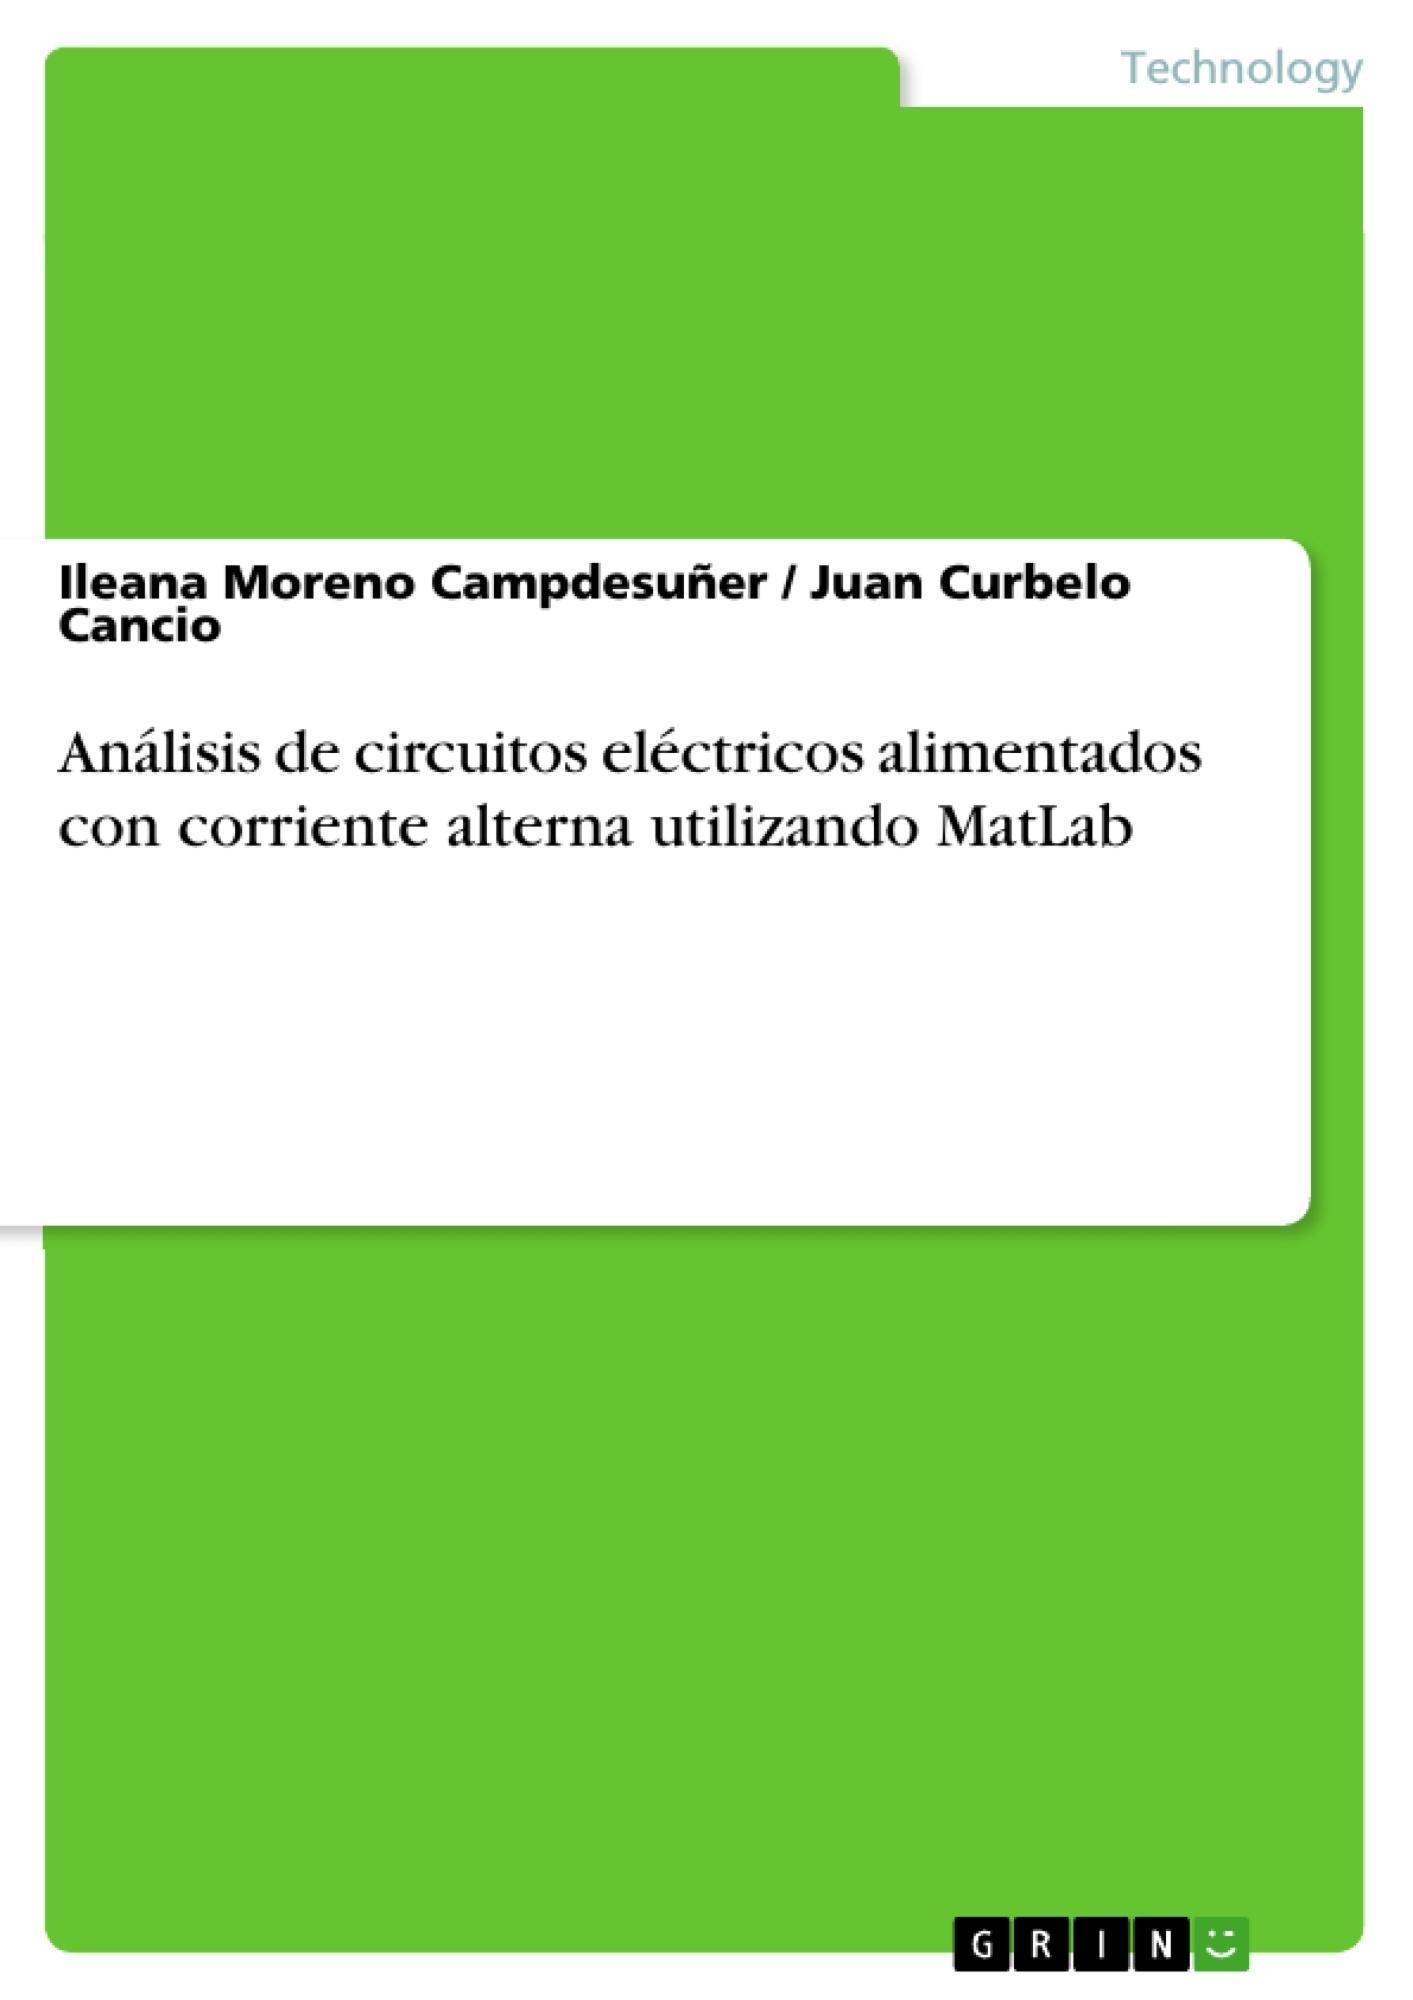 Circuito Rlc : Me salva rlc circuito rlc analogia massa mola elétron